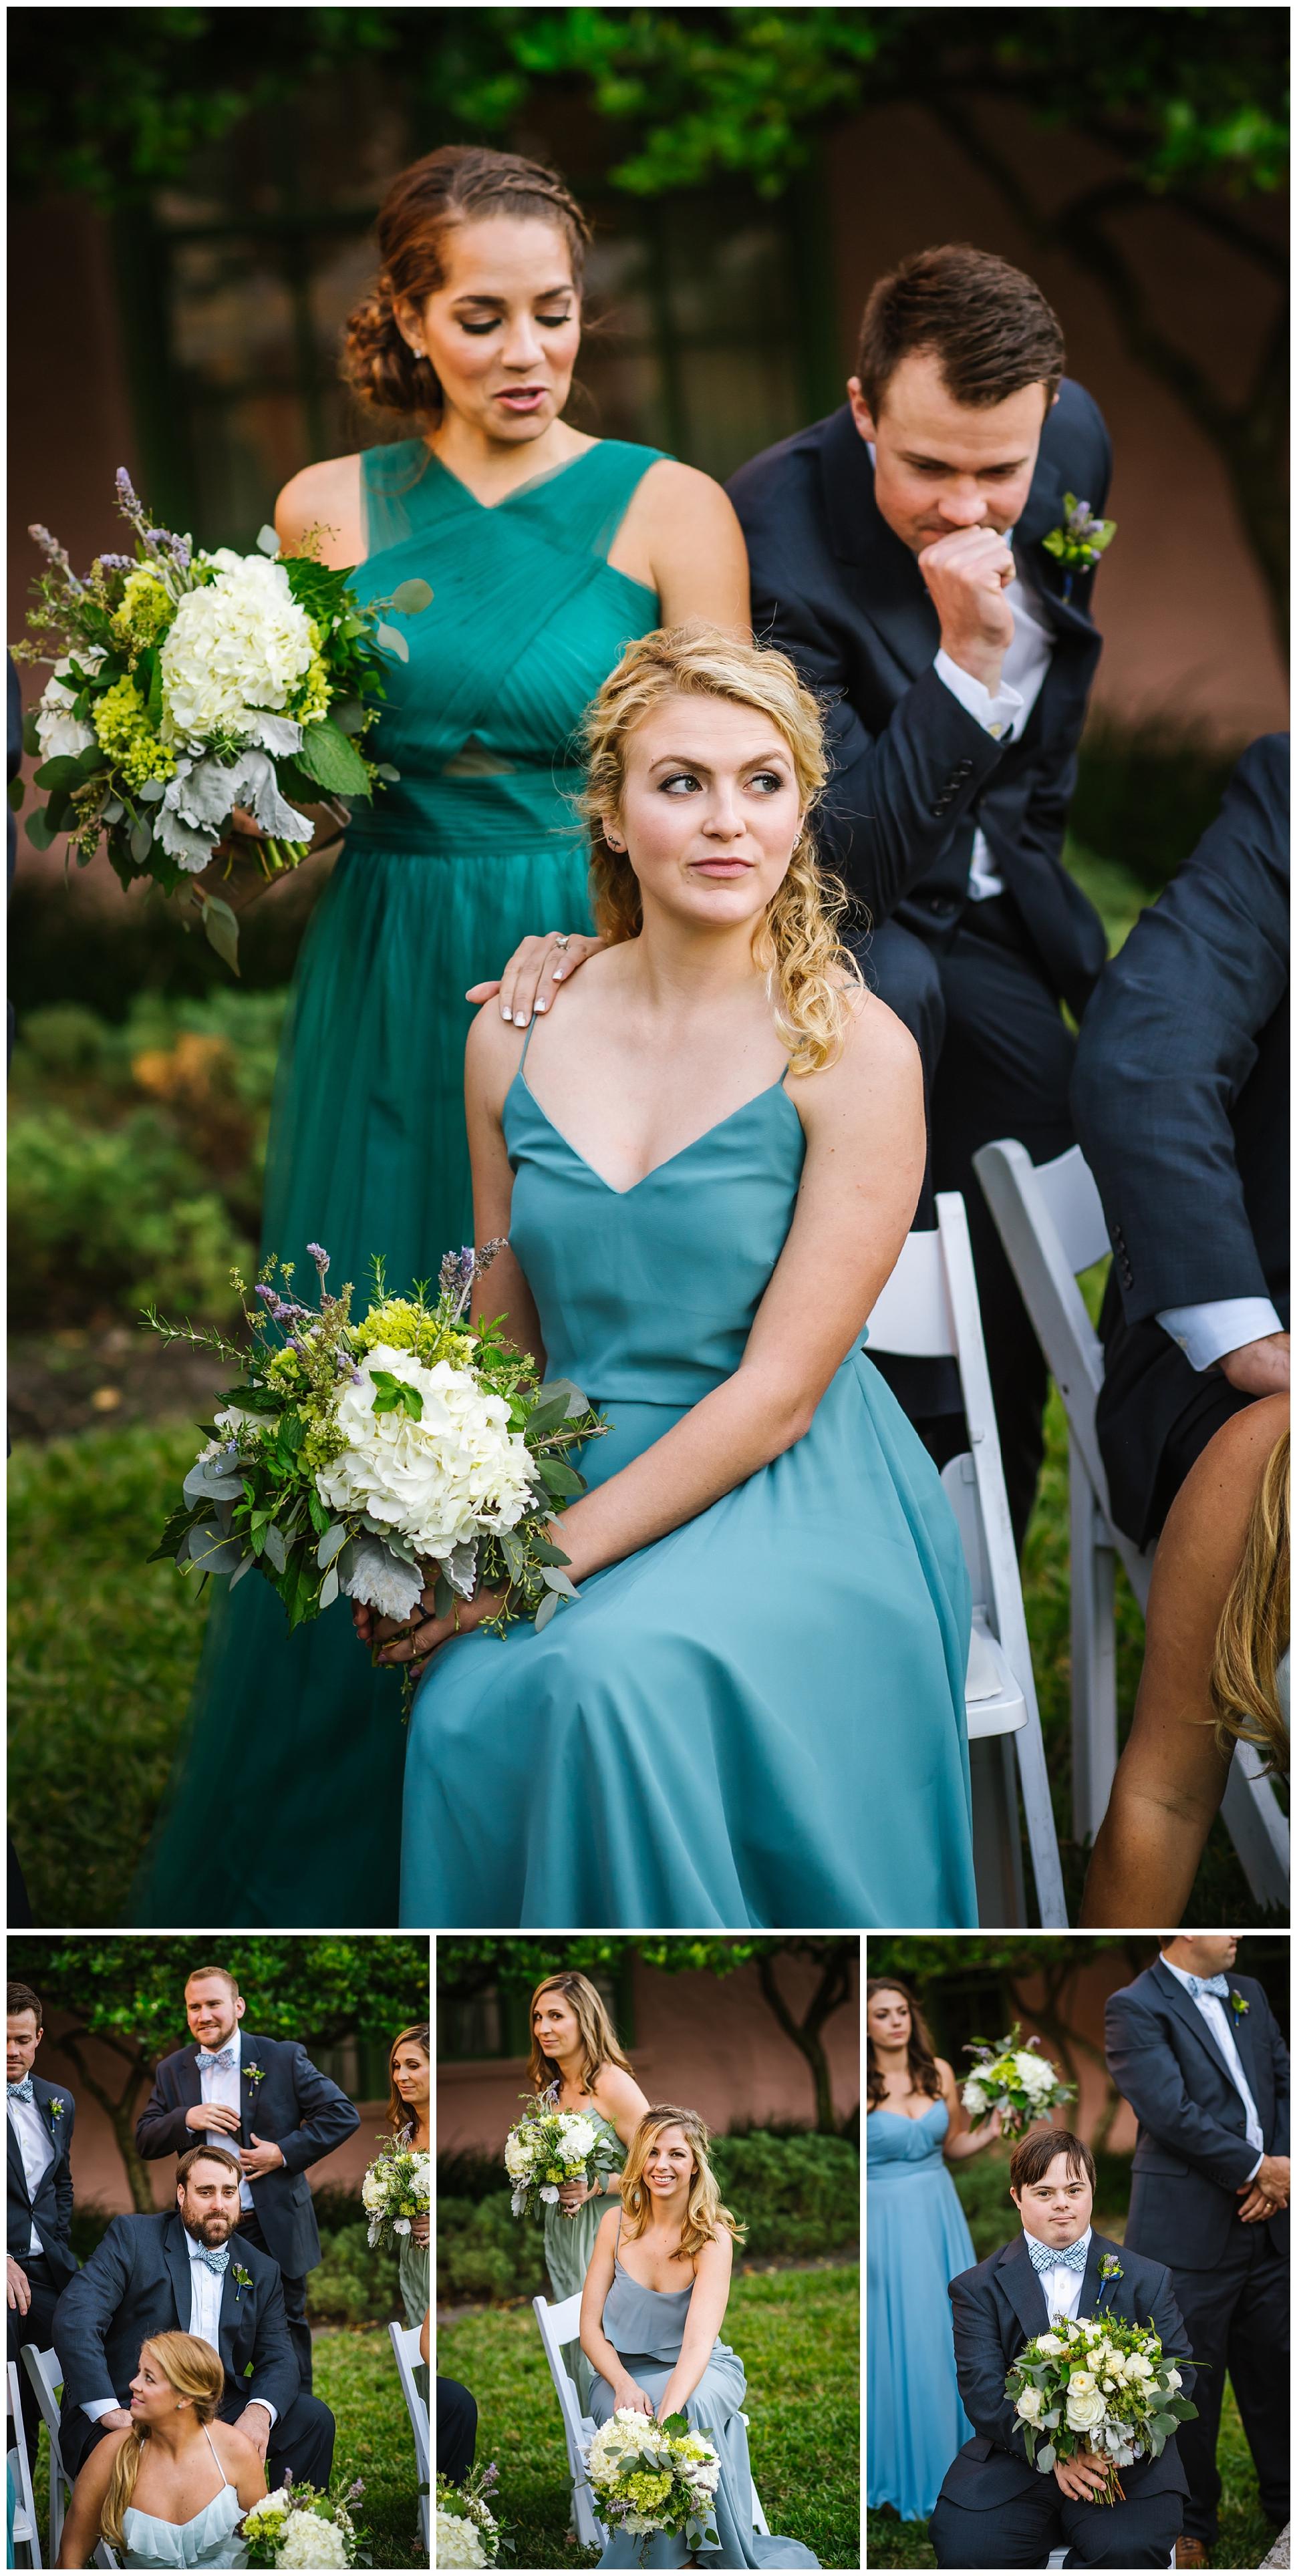 St-pete-wedding-photographer-grand-ballroom-vinoy-tea-garden-greek-luxury_0146.jpg